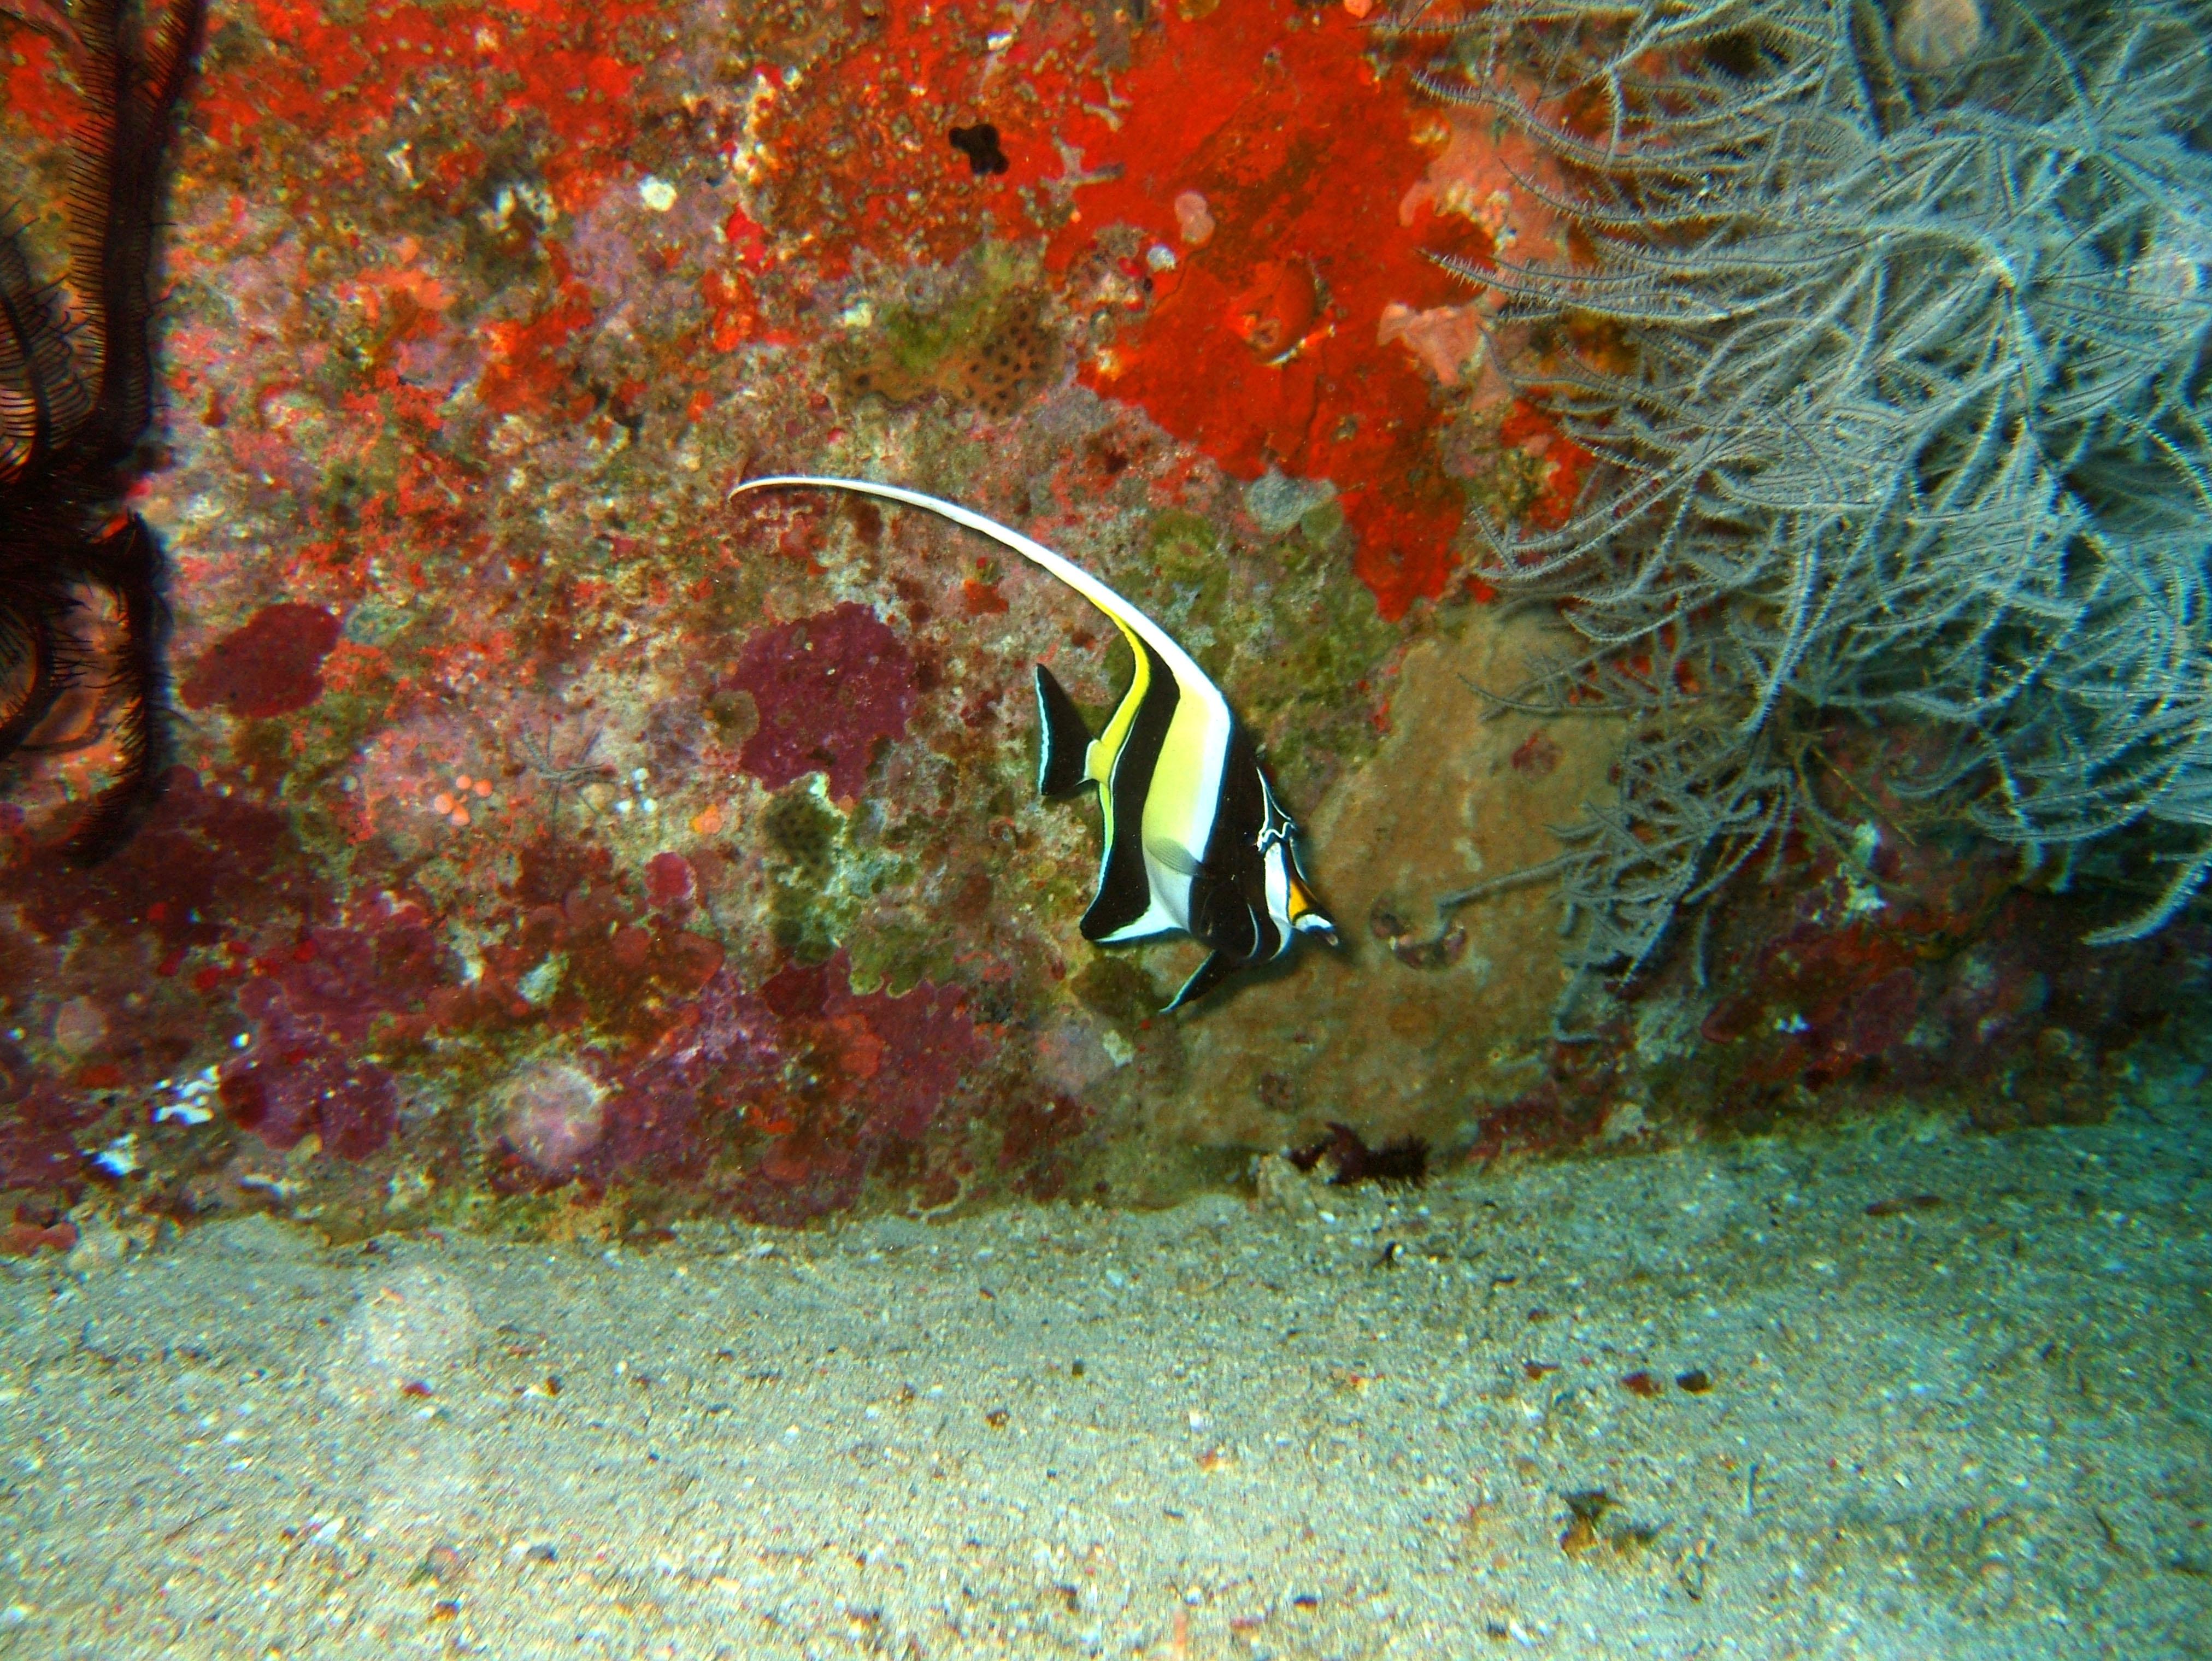 Dive 8 Philippines Mindoro Sabang Junk Nov 2005 39